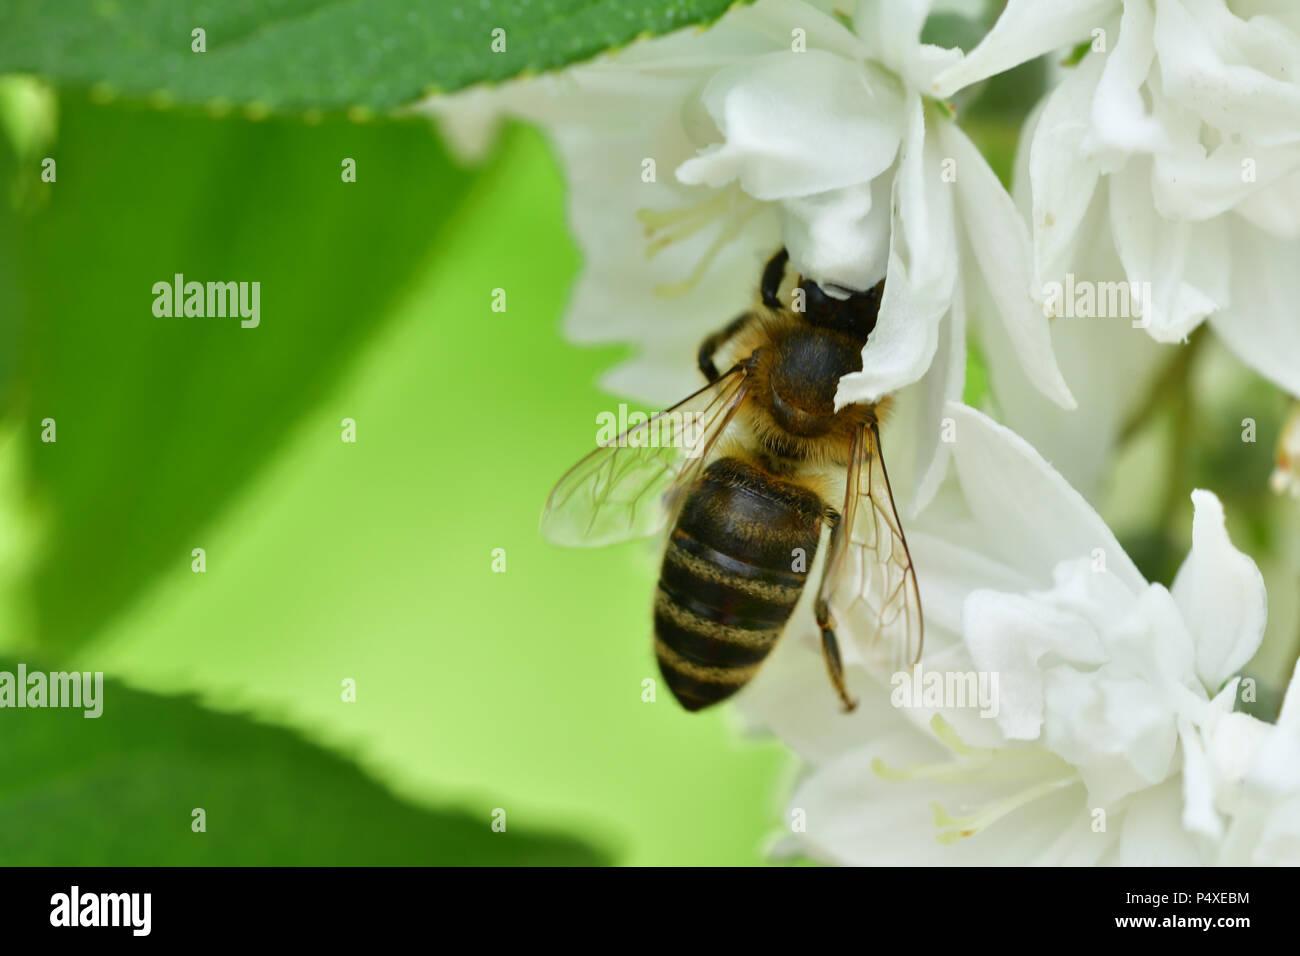 Honey Bee polinating on the white flower macro - Stock Image